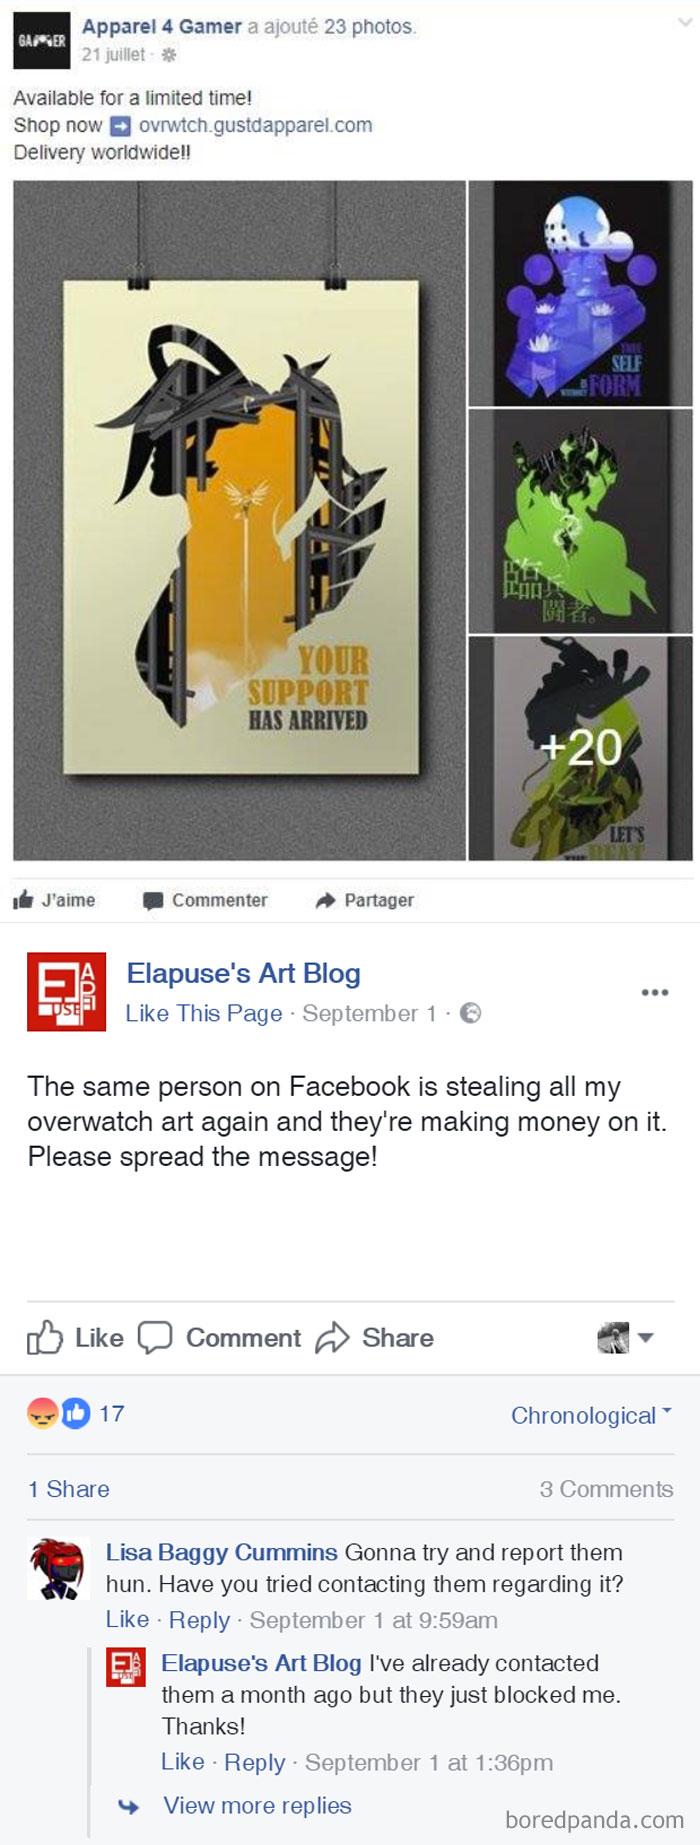 Internet Shop Stealing All Artist's Elapuse Art To Make Money Of It